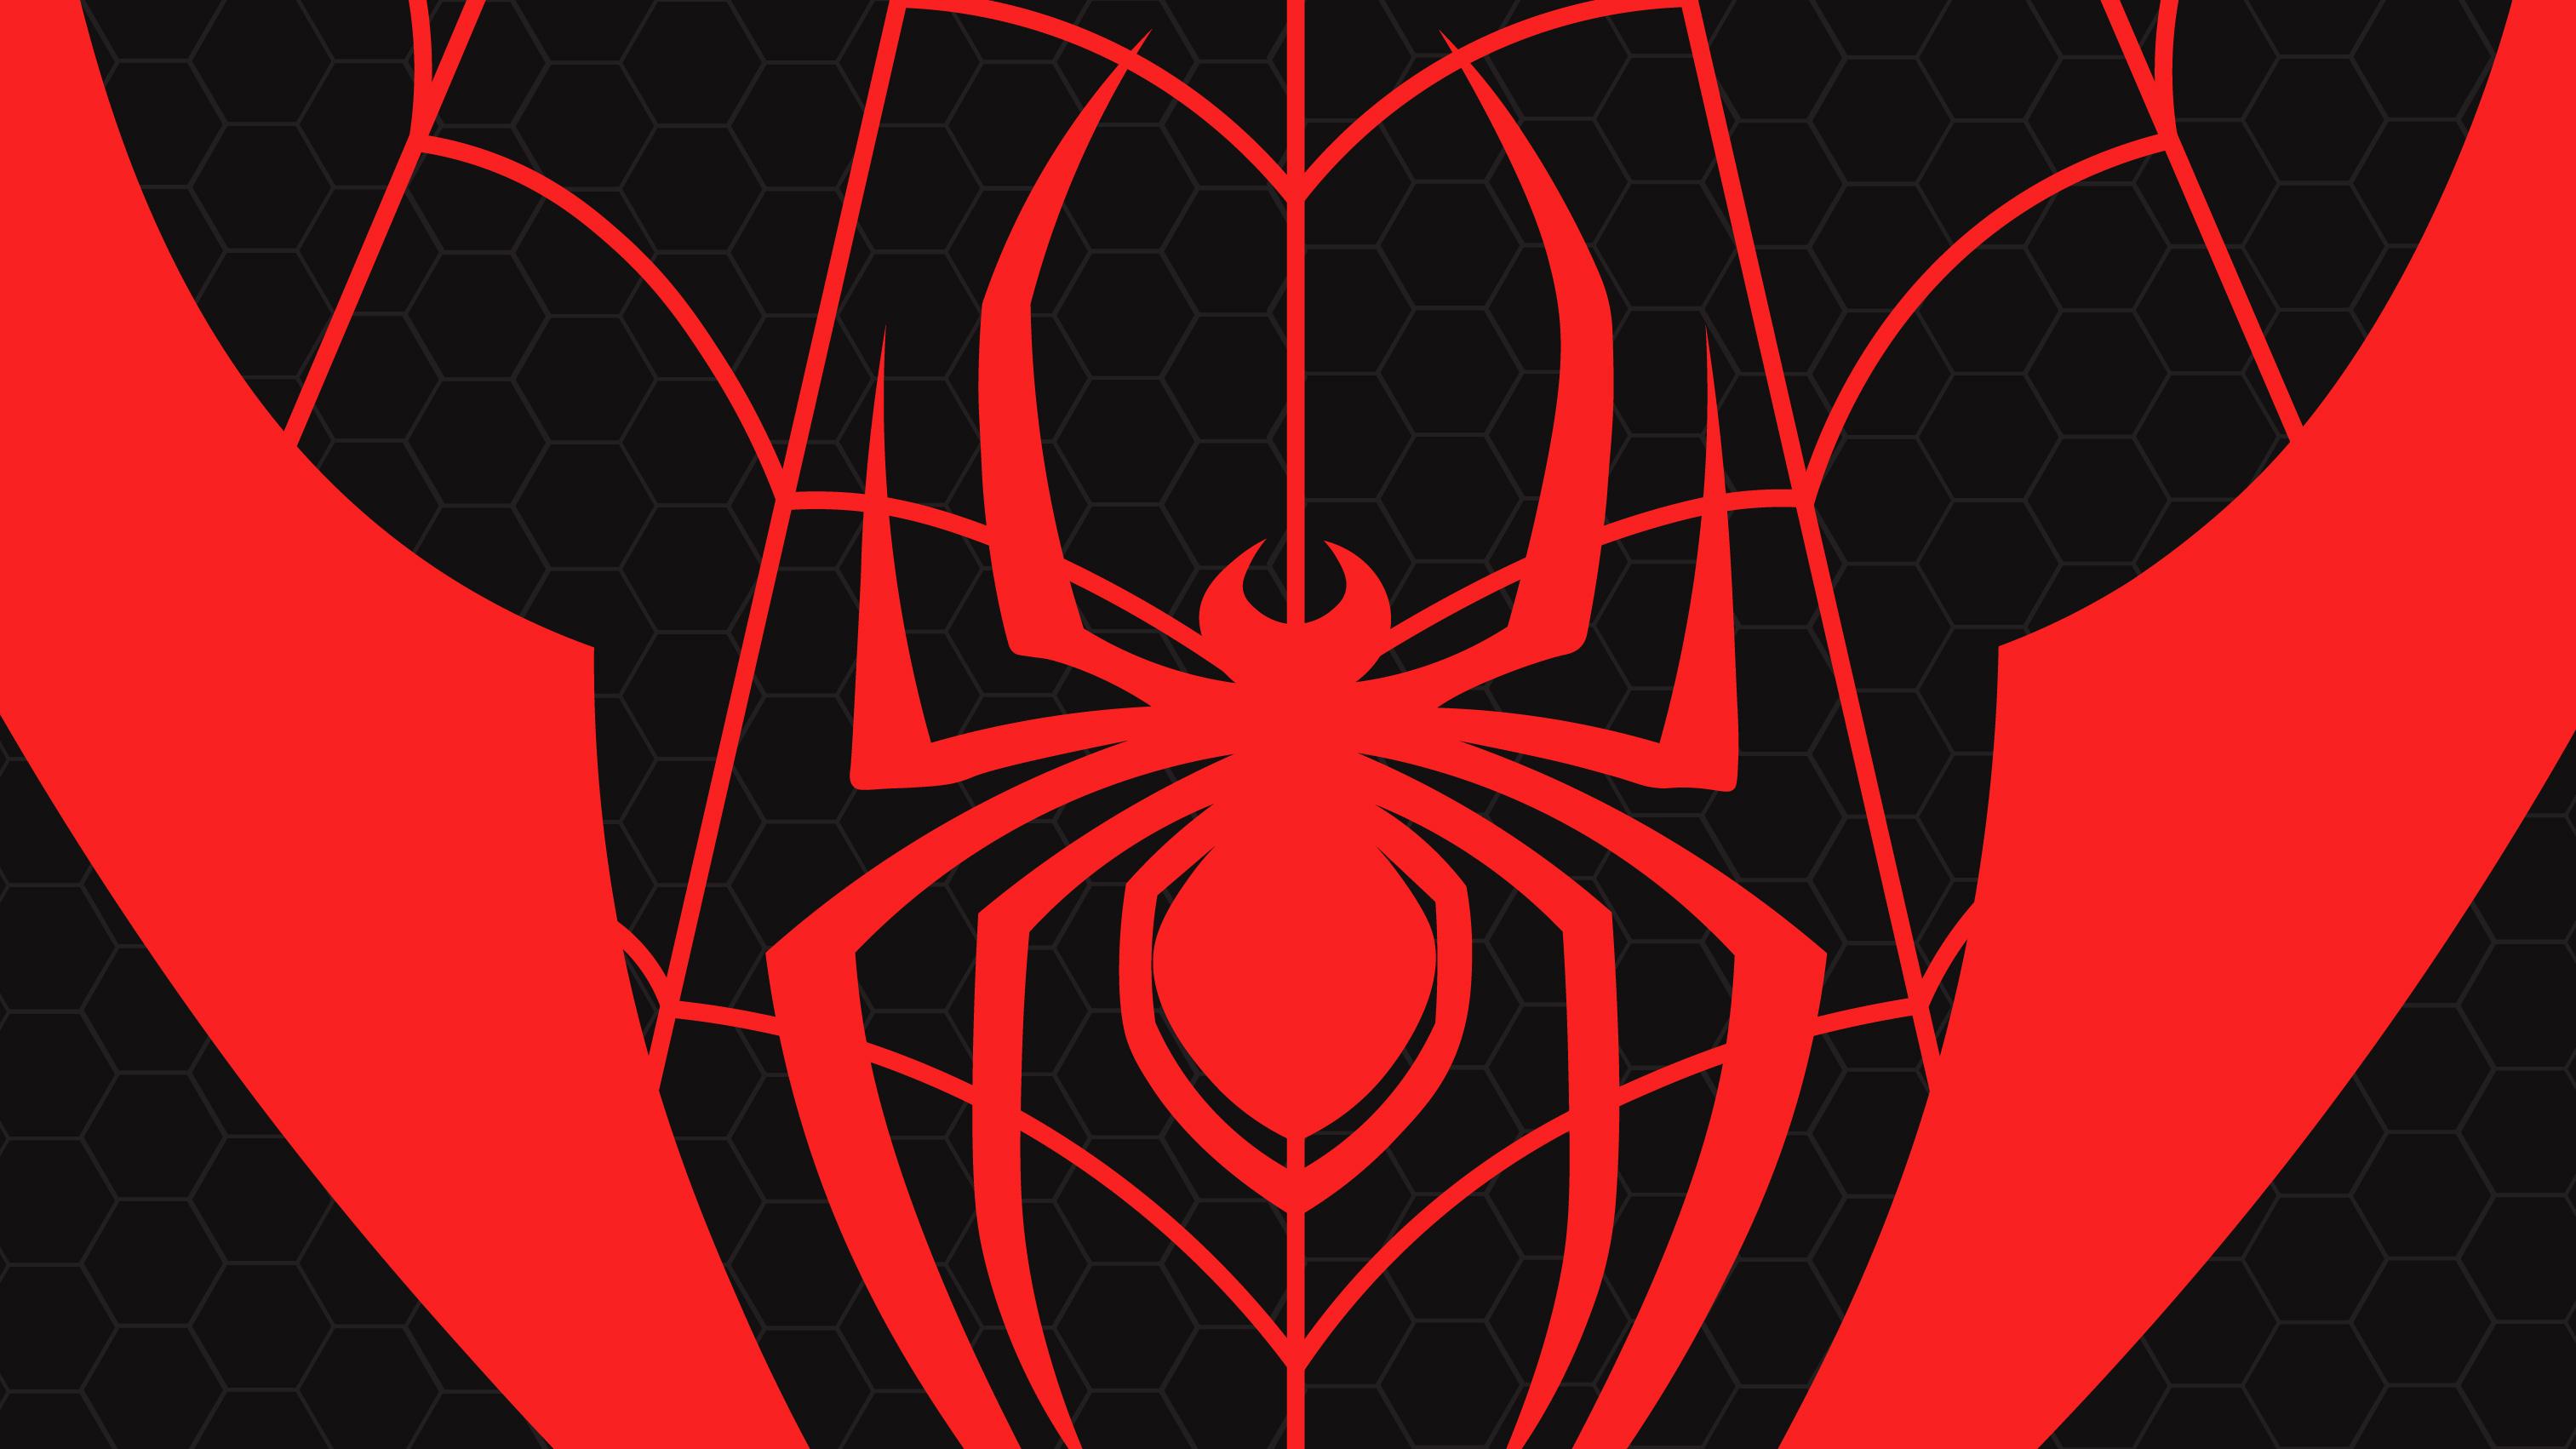 1366x768 Miles Morales Spiderman Logo 1366x768 Resolution Hd